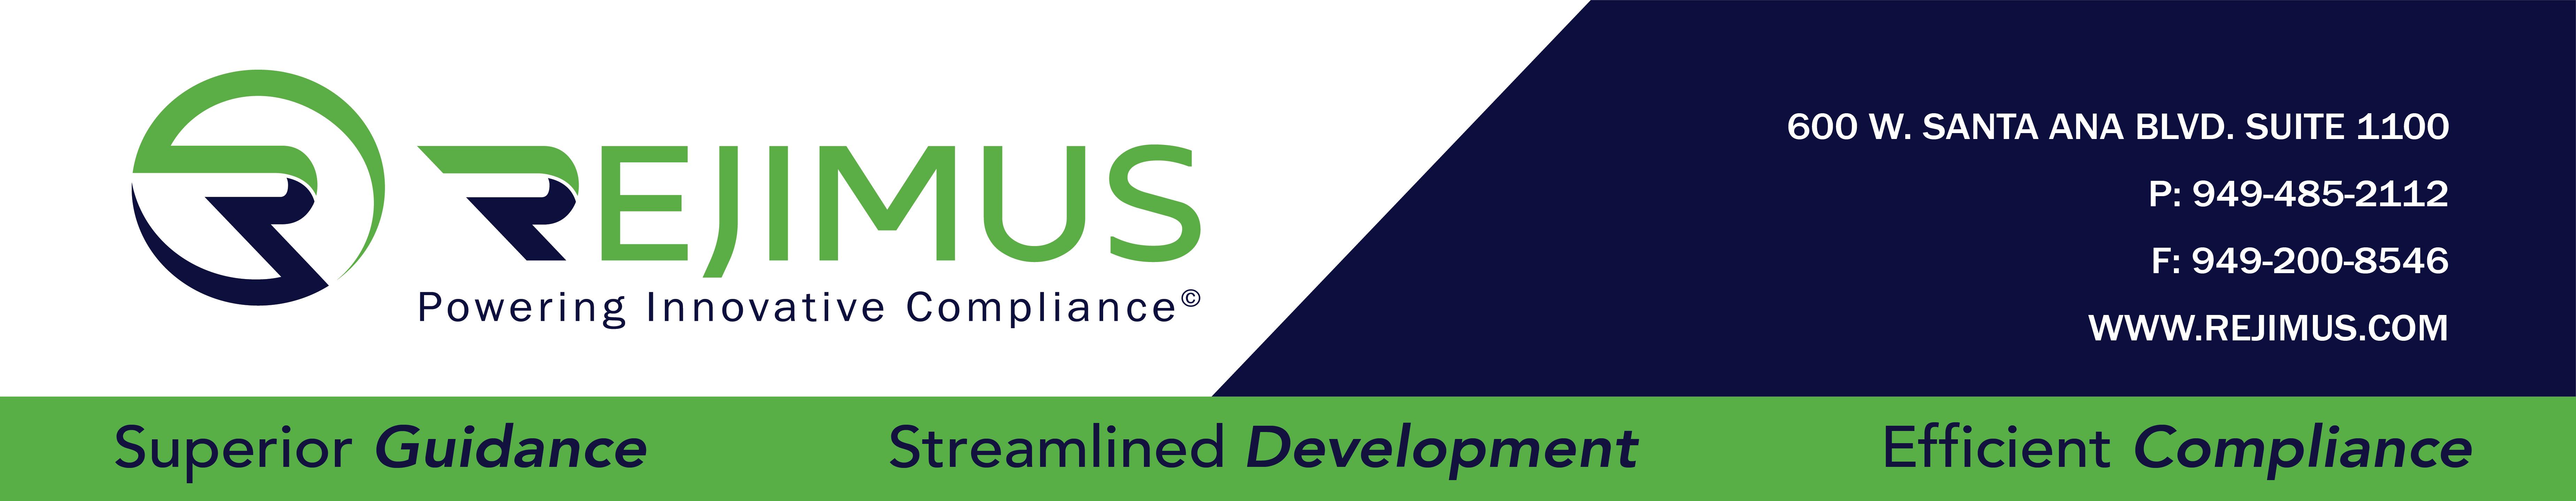 Label Review - REJIMUS Heading